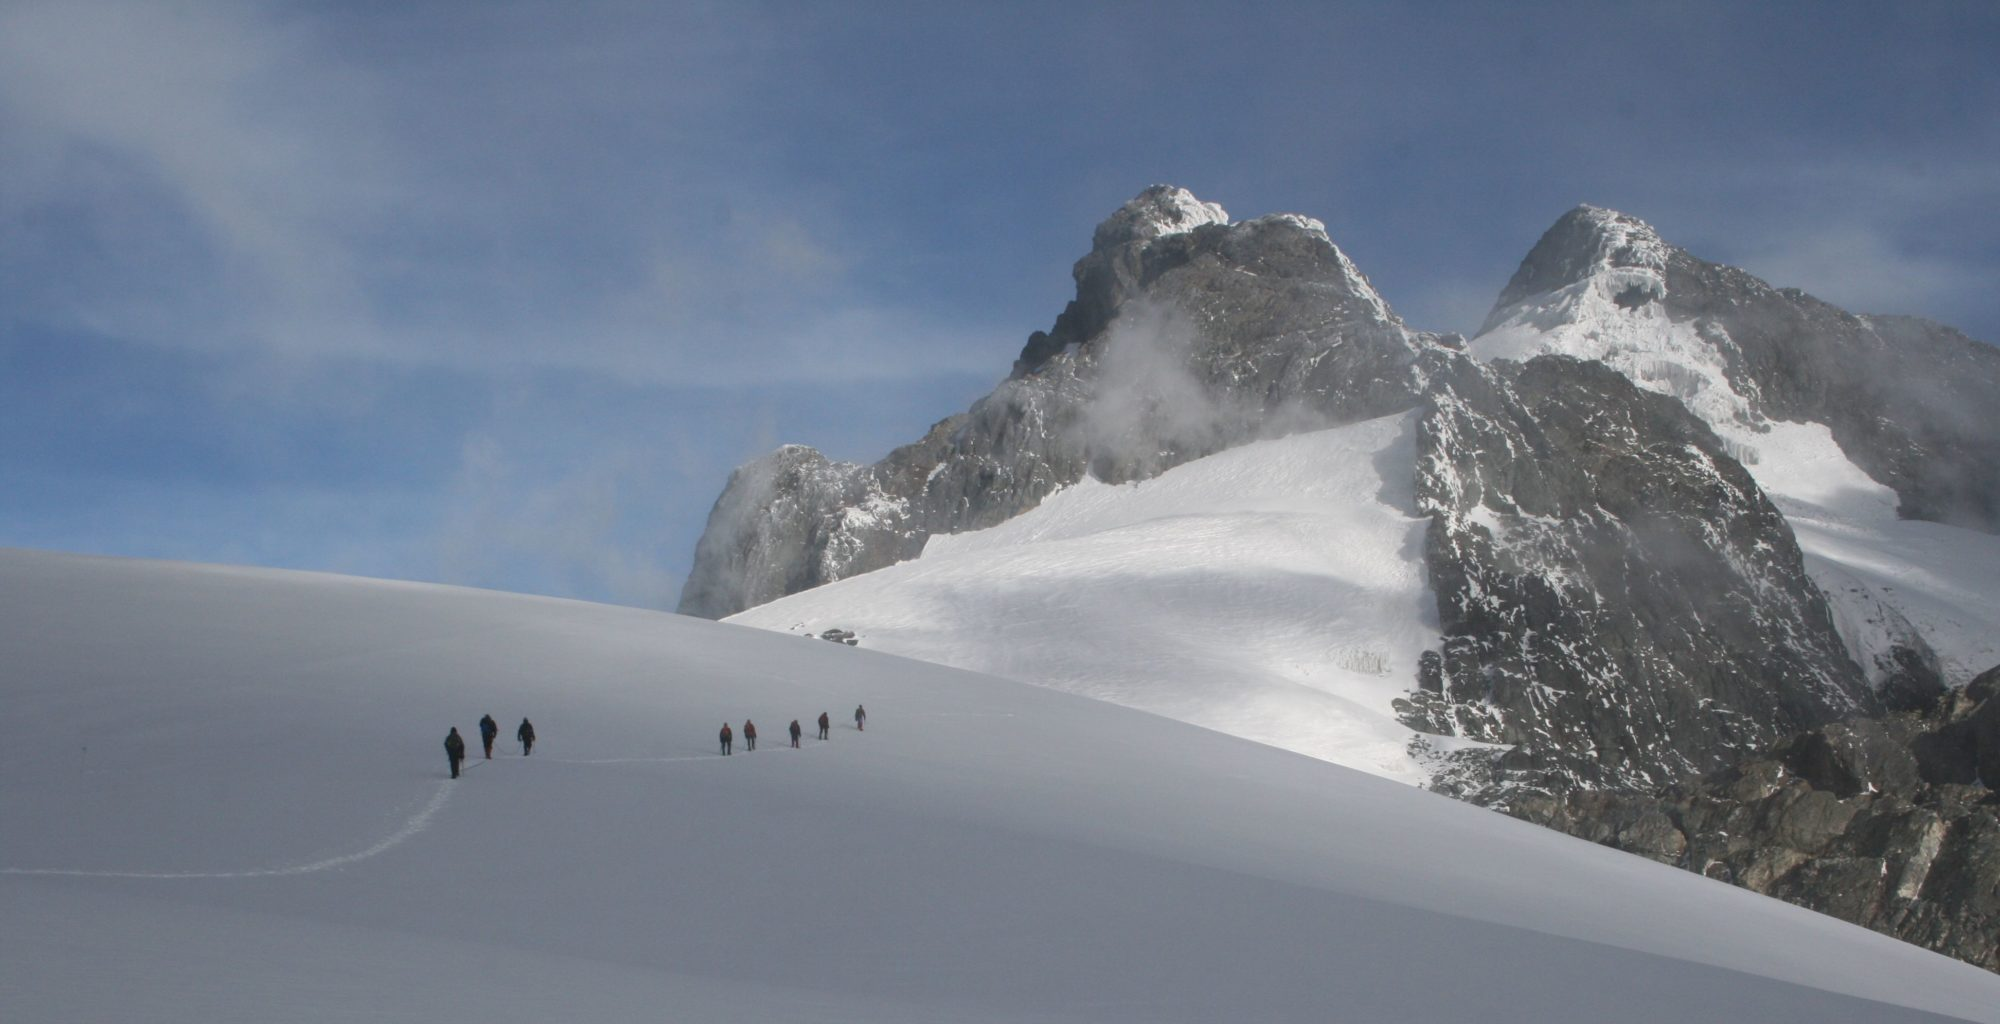 Uganda-Rwenzori-Mountains-Snow